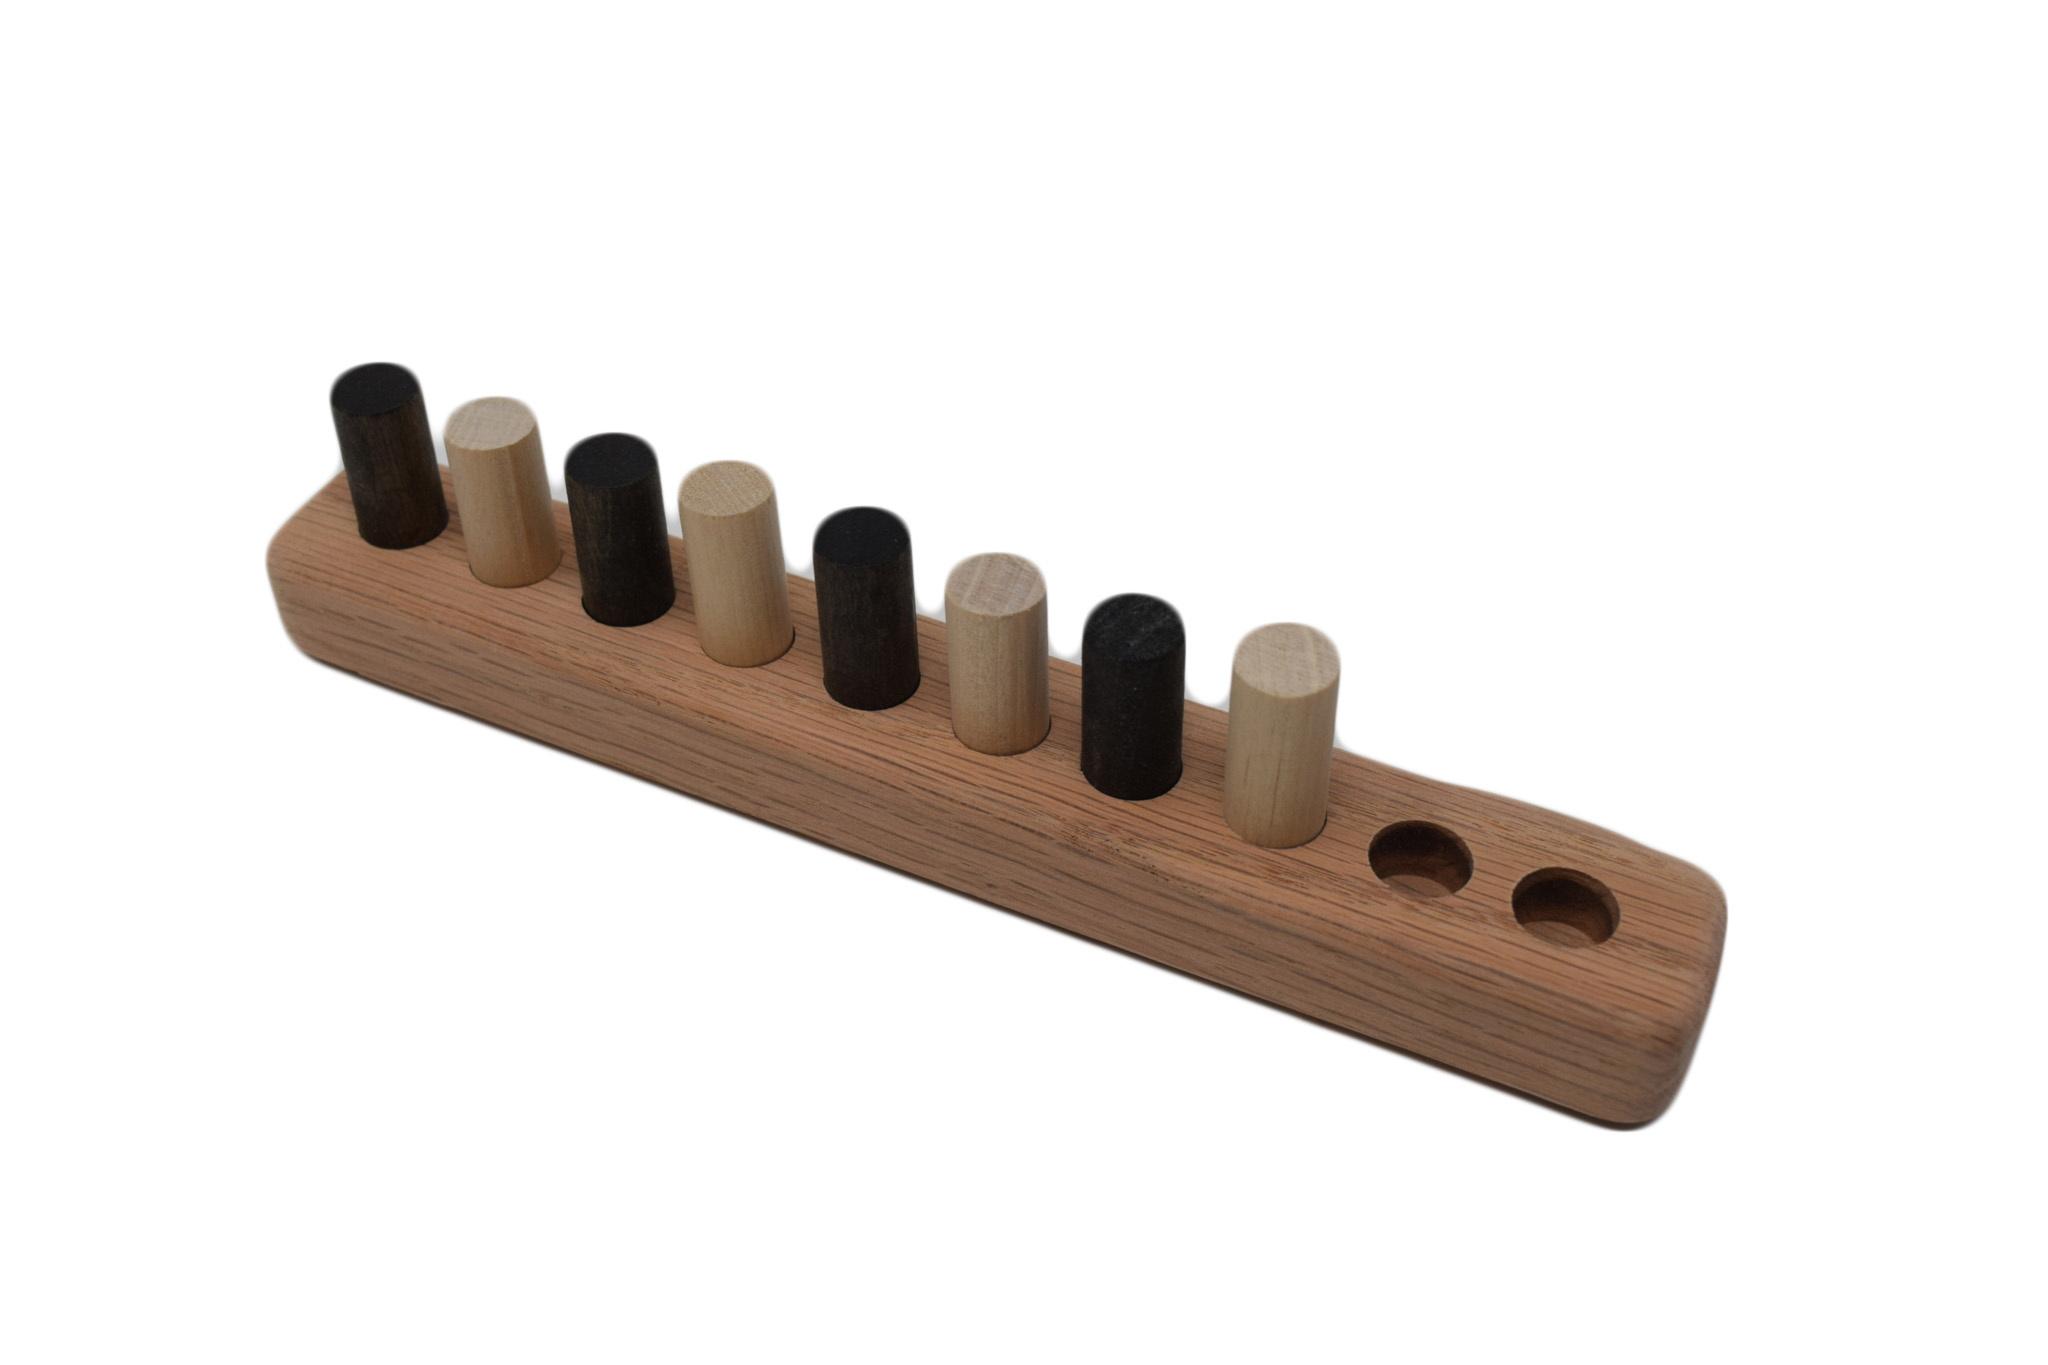 Peg Puzzle Game-1